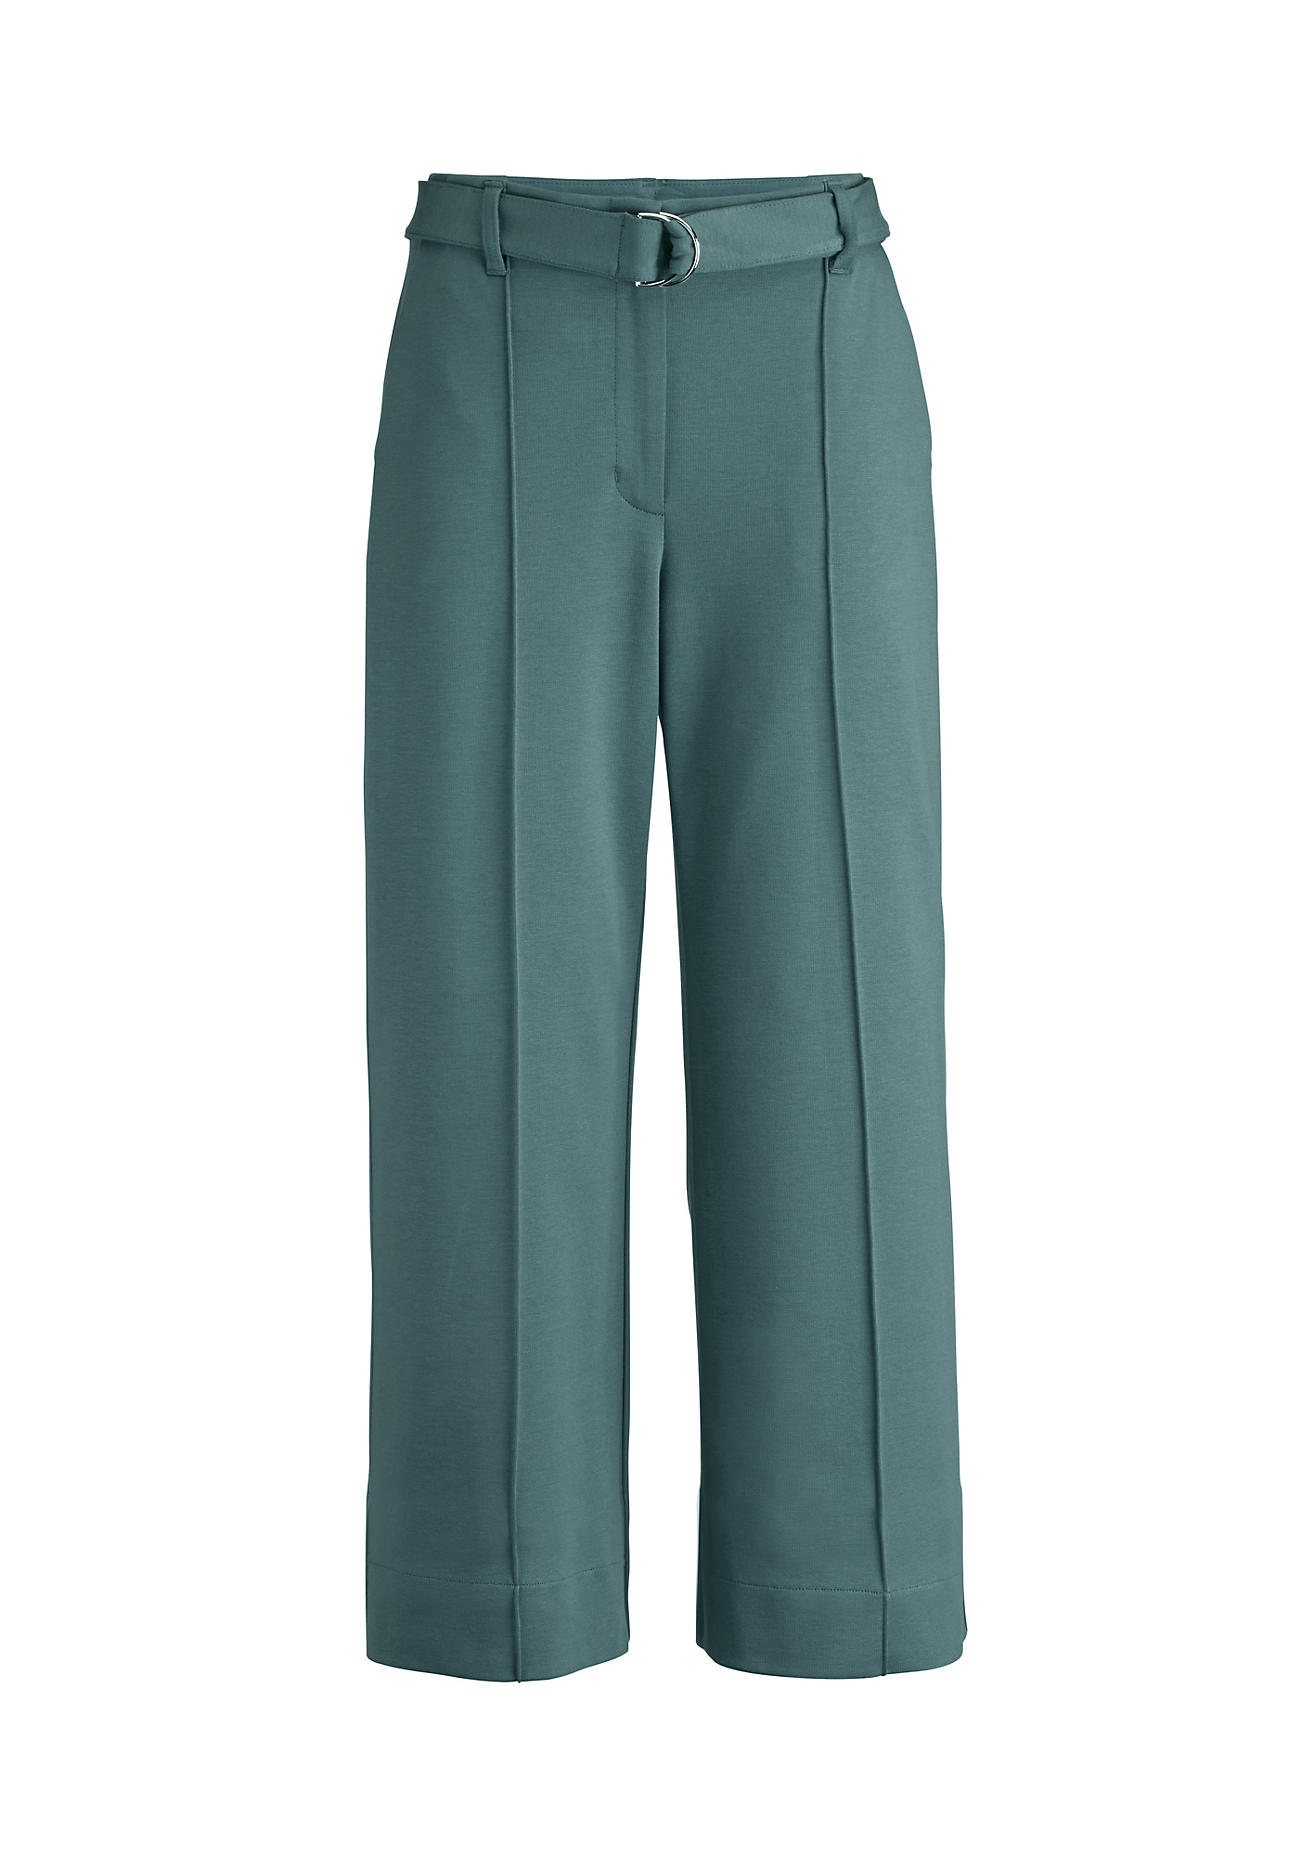 Hosen - hessnatur Damen Jersey Culotte aus Bio Baumwolle mit TENCEL™Modal – grün –  - Onlineshop Hessnatur